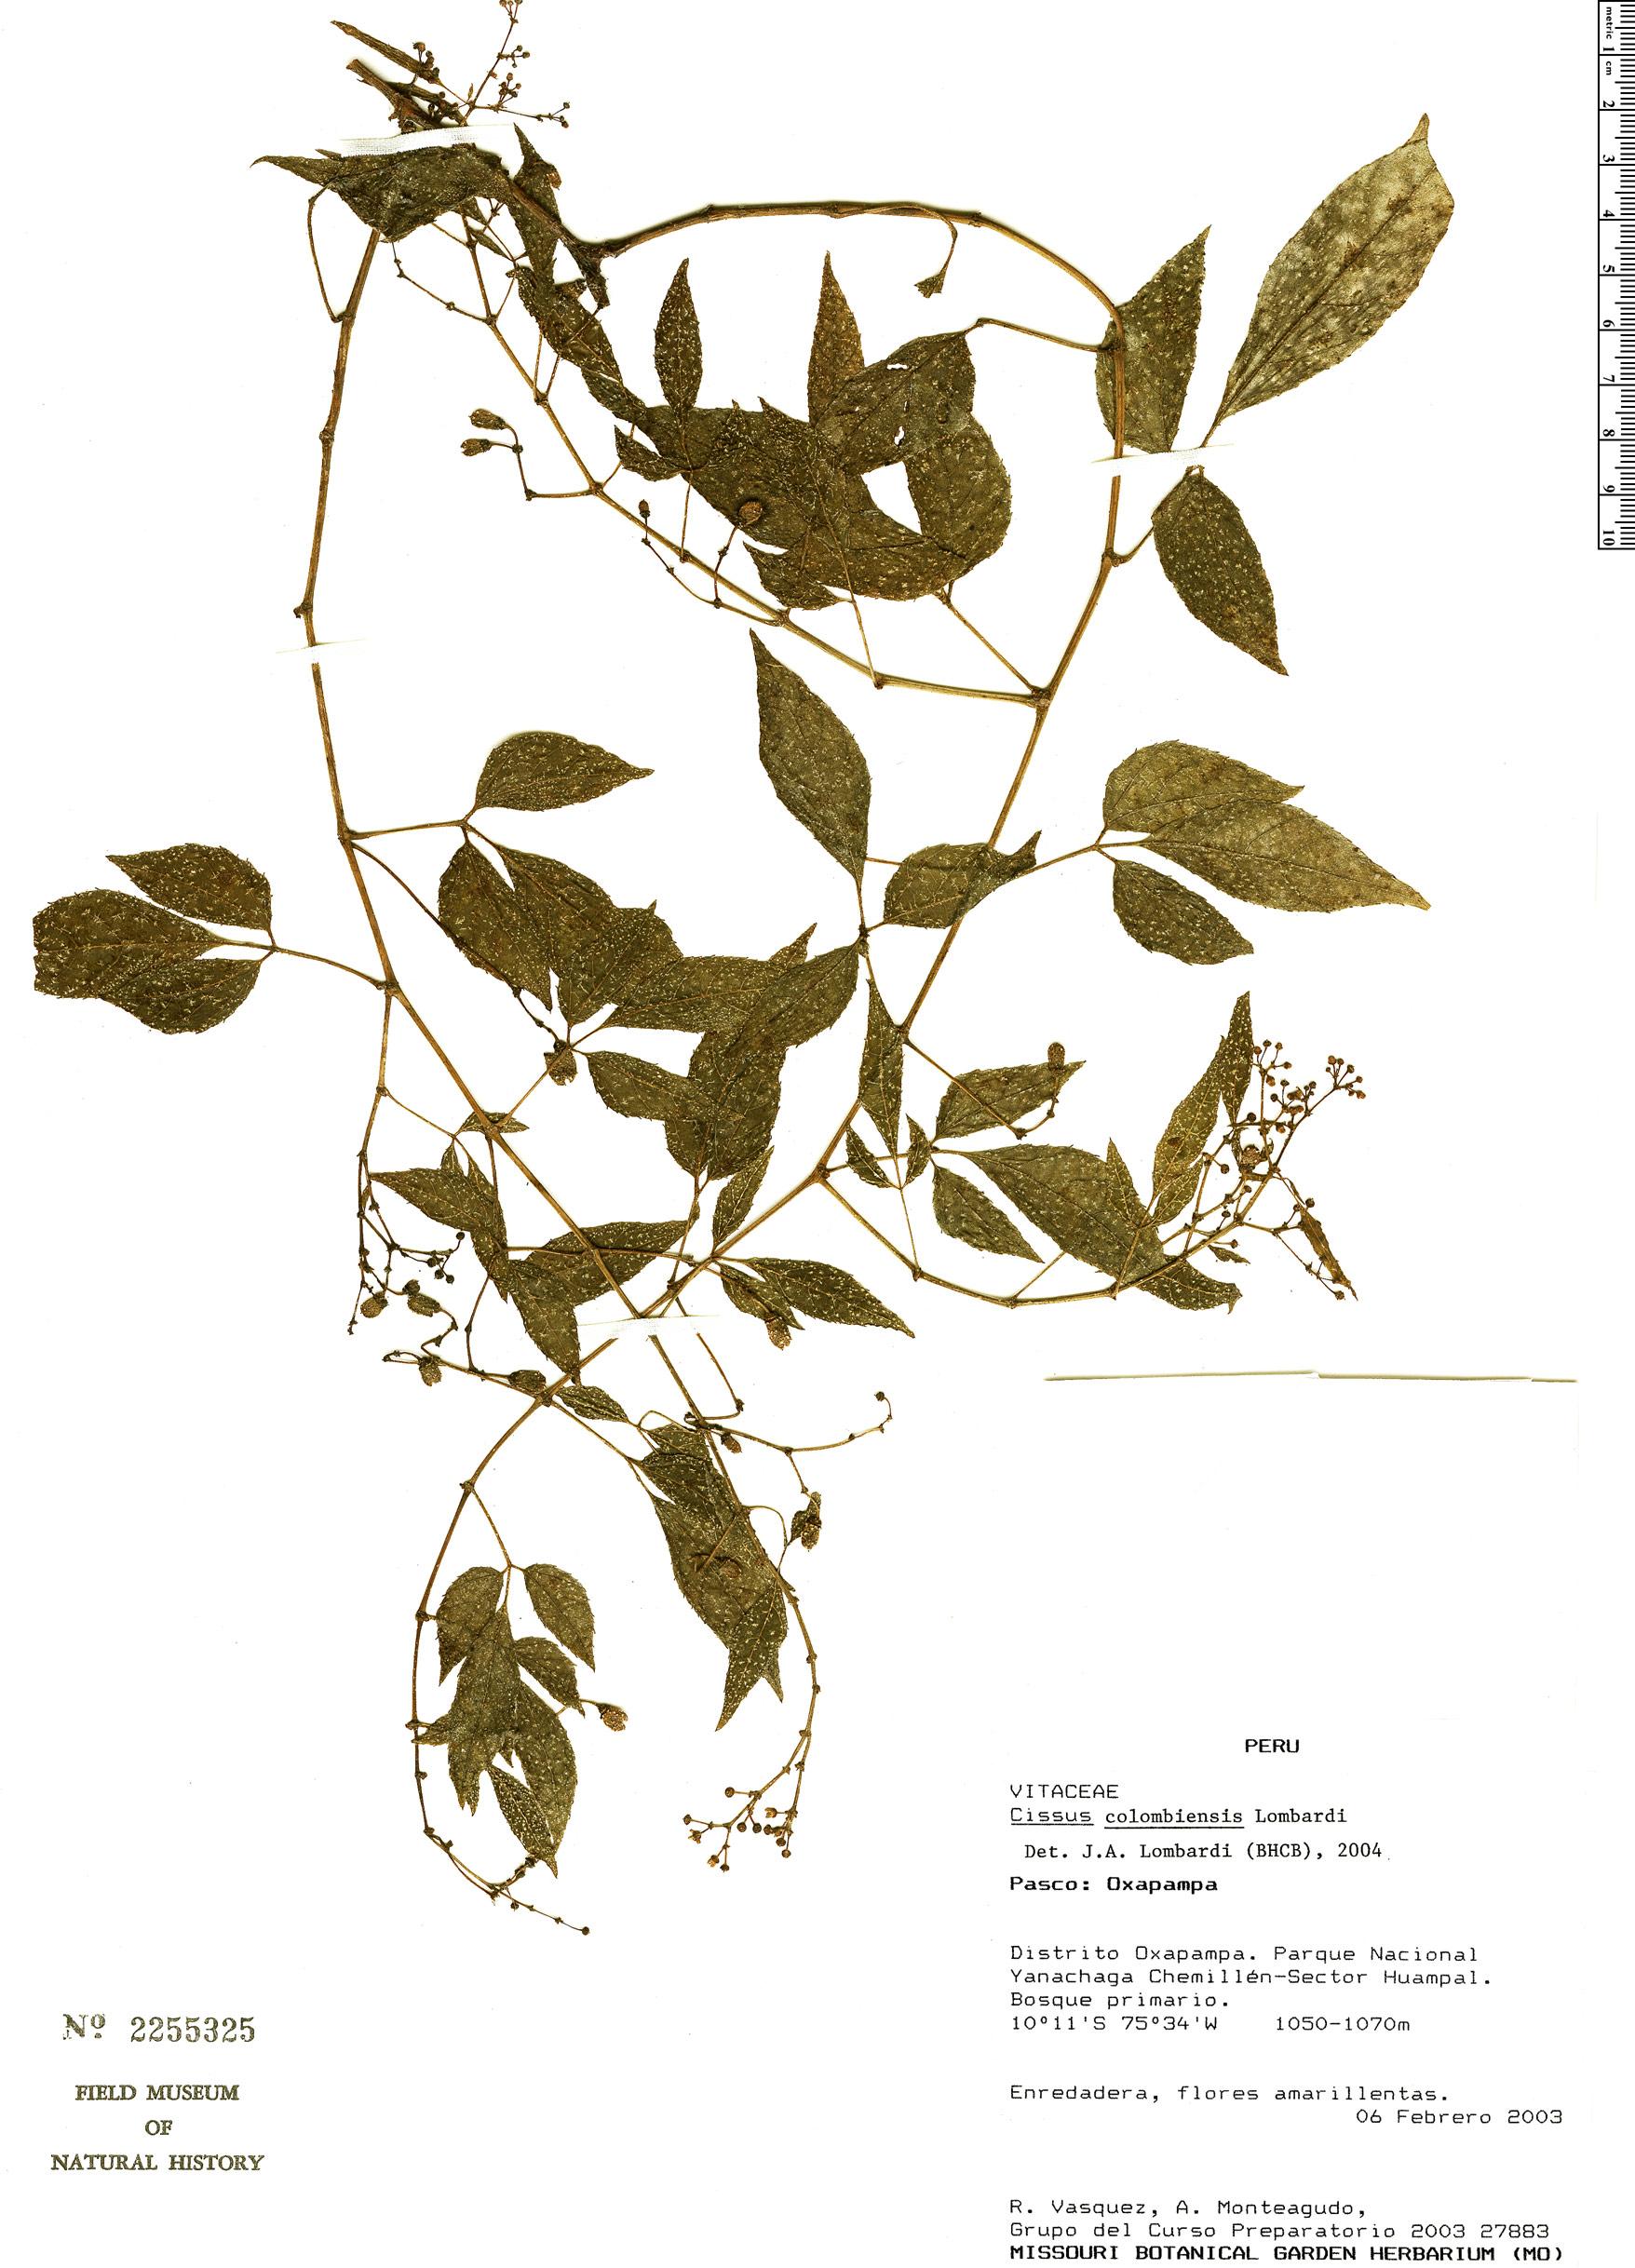 Specimen: Cissus colombiensis